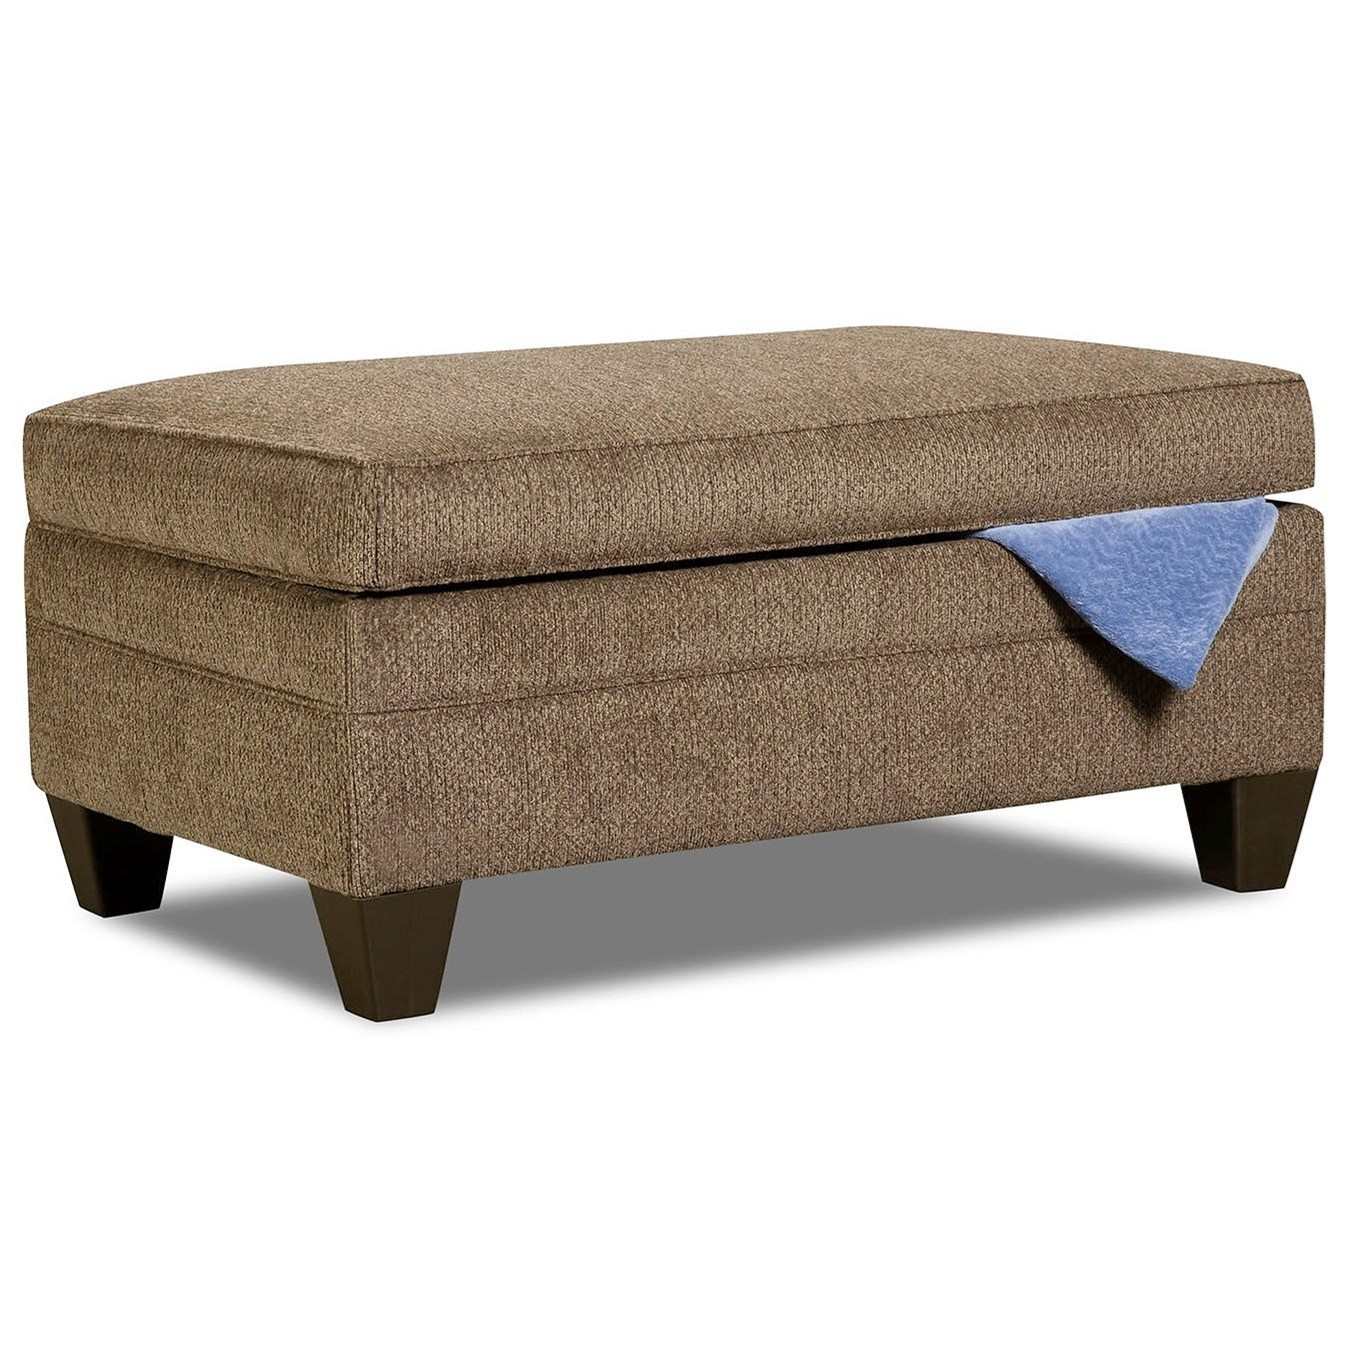 6485 Transitional Storage Ottoman by United Furniture Industries at Bullard Furniture